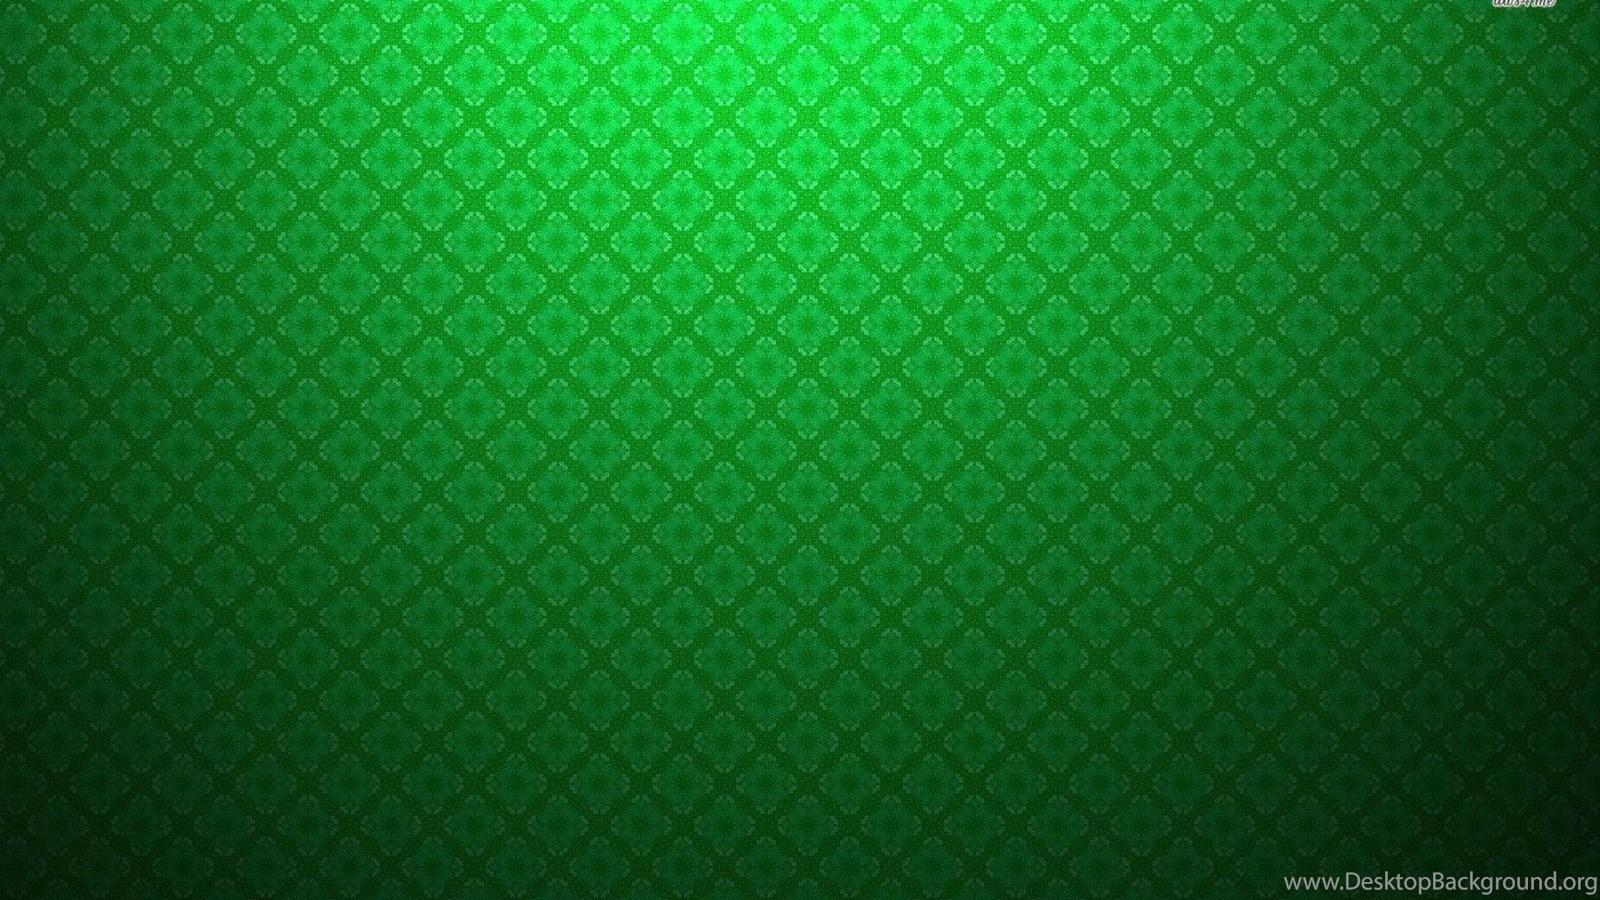 green floral backgrounds texture wallpaper  green